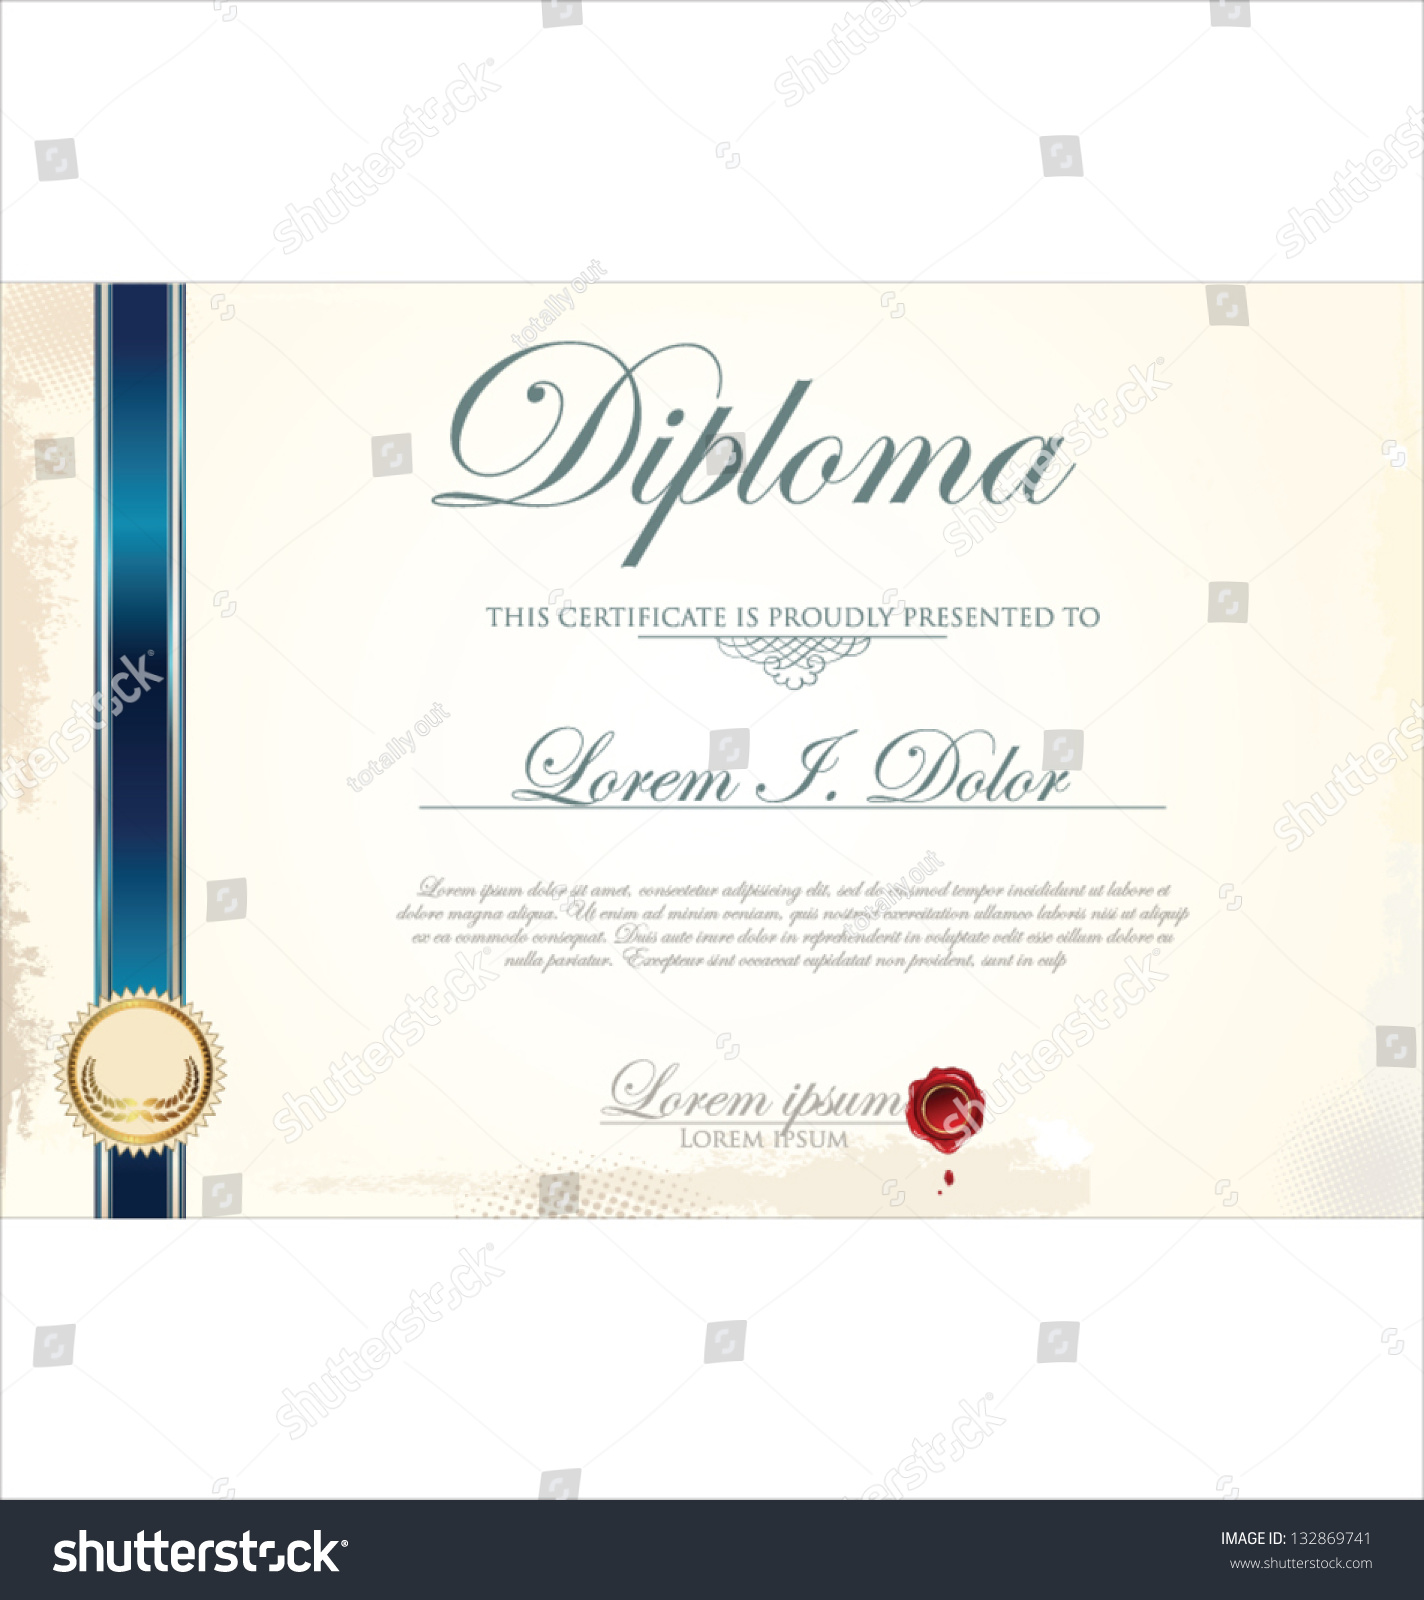 certificate template stock vector 132869741 shutterstock certificate template